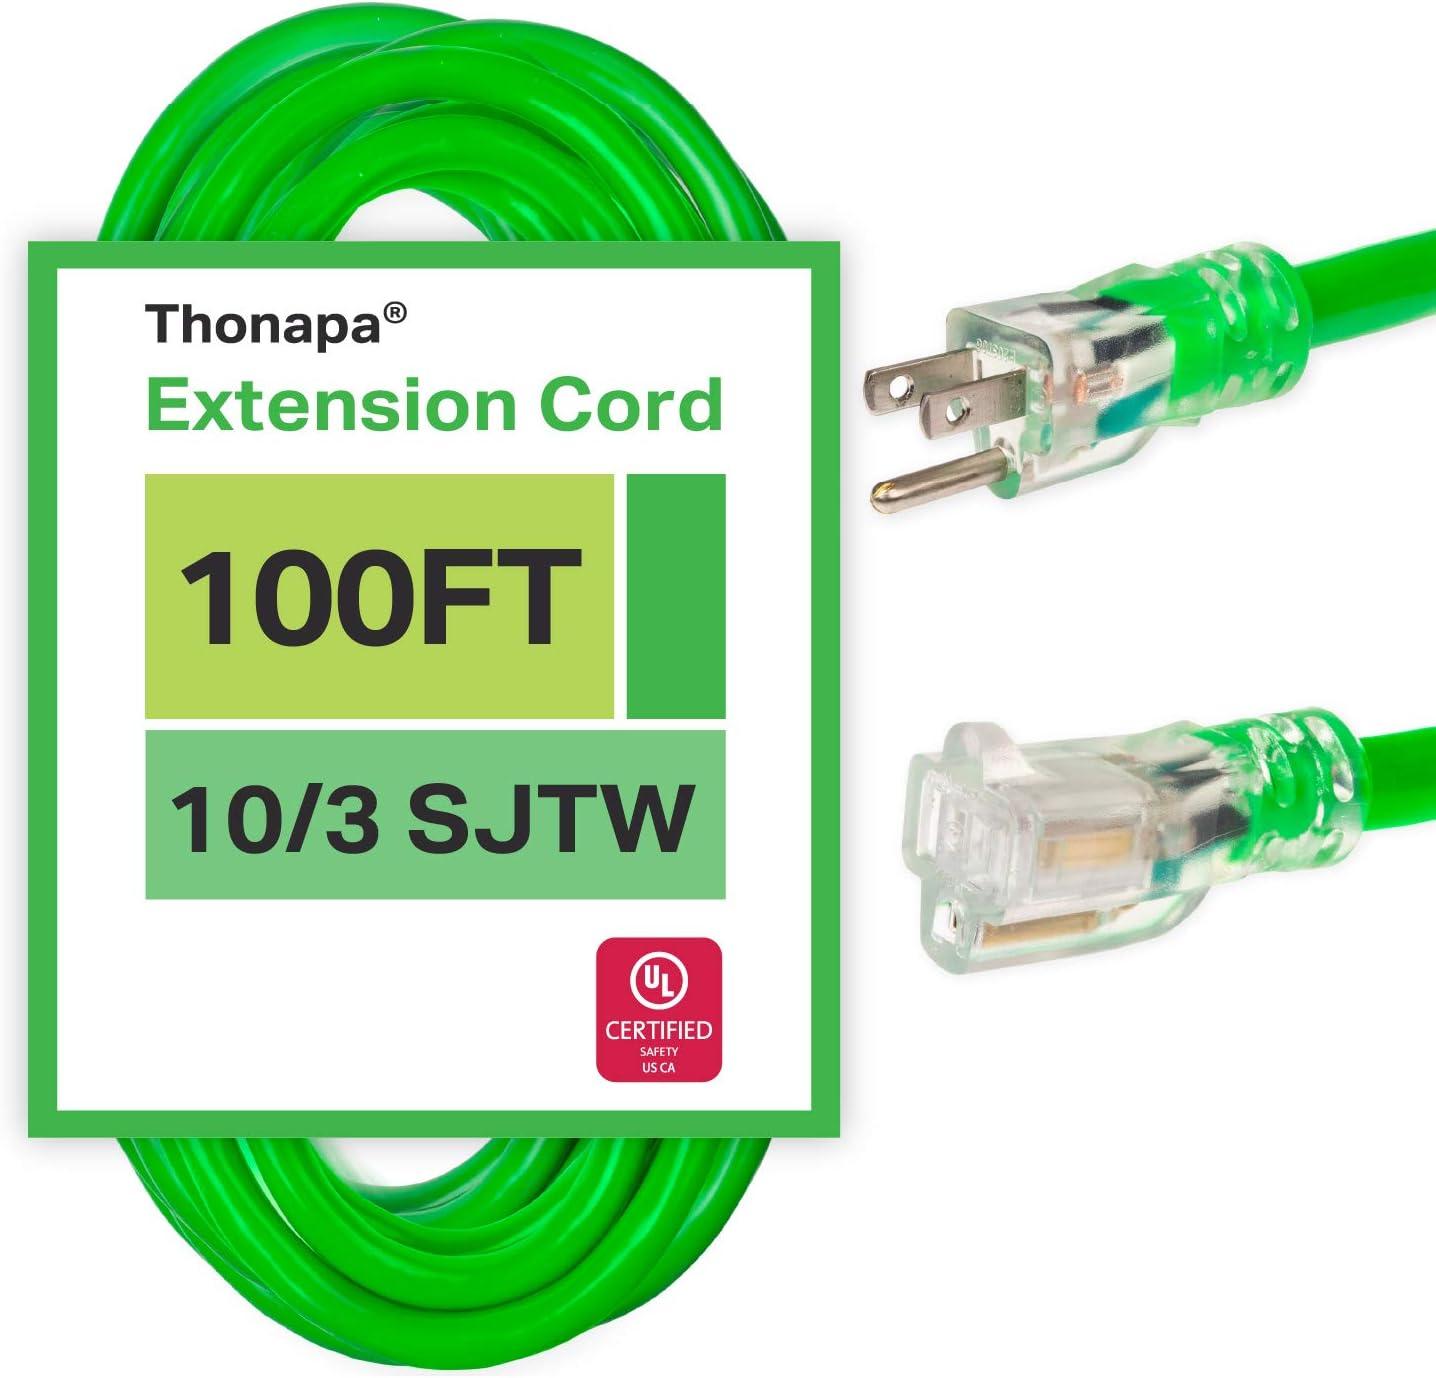 100 Foot Outdoor Extension Cord - Neon Daily bargain sale mart 3 Green 10 SJTW Gauge